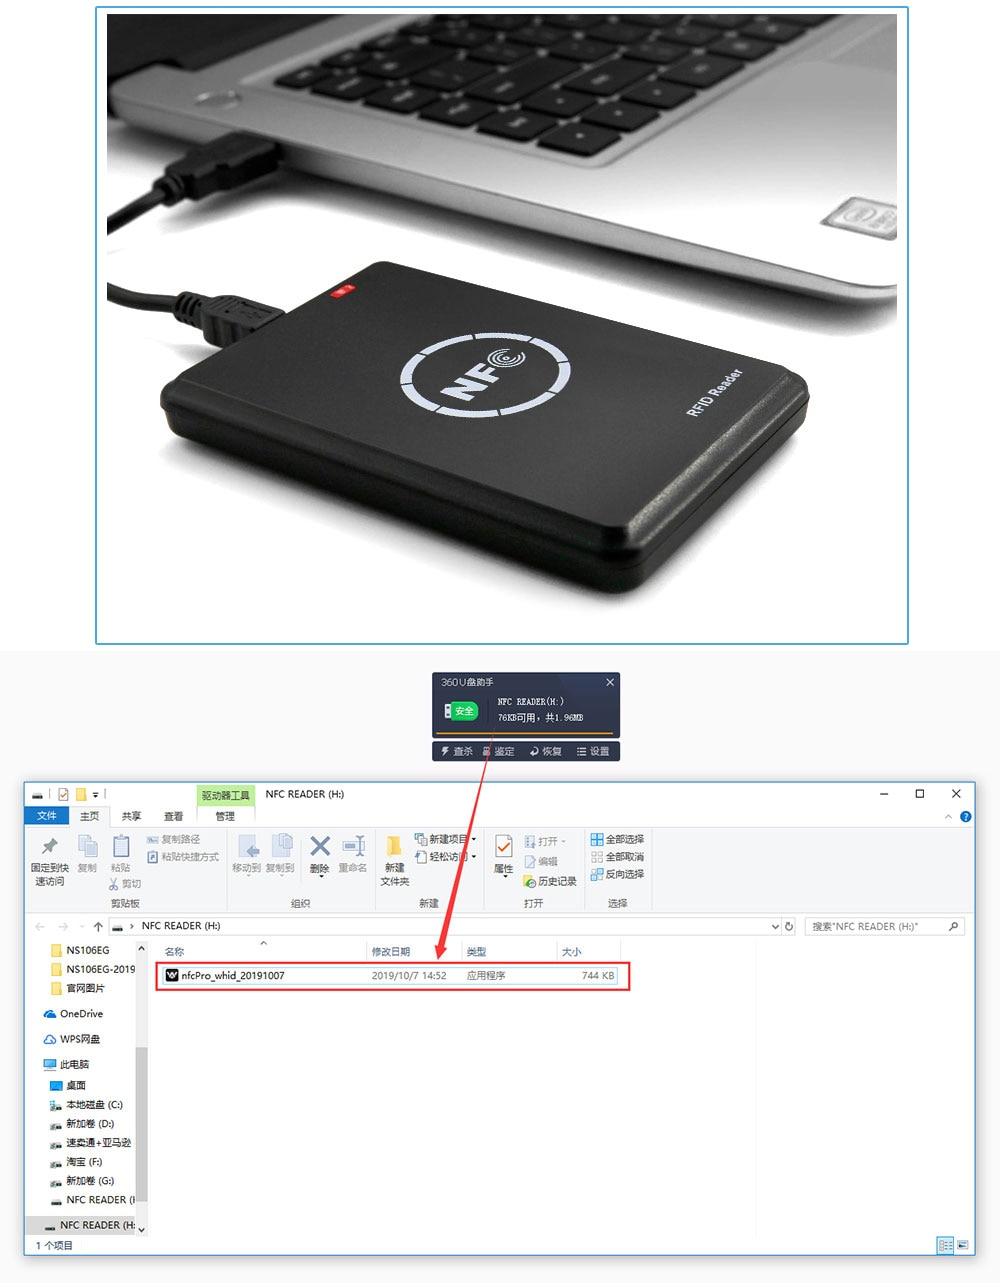 Hc323264380bf4608a2da625b54531e1bX RFID Copier Duplicator 125KHz Key fob NFC Smart Card Reader Writer 13.56MHz Encrypted Programmer USB UID T5577 EM4305 Cards Tags